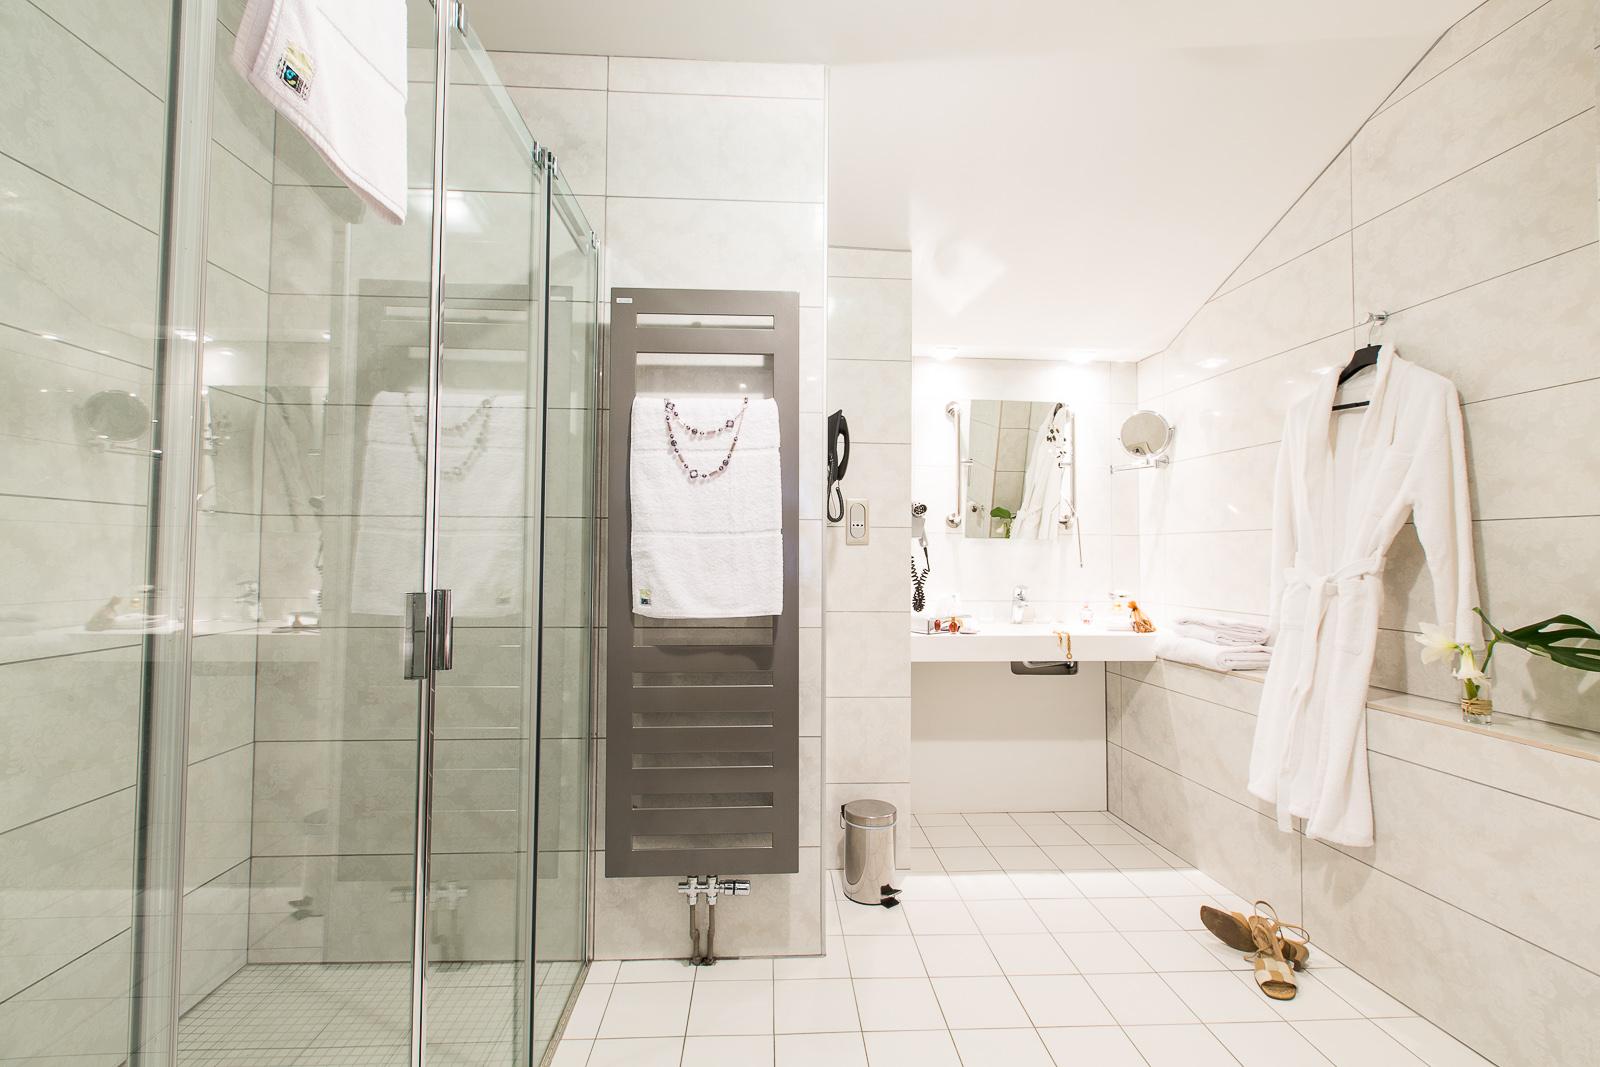 Hôtel Marotte chambre cosy salle de bain blanche douche